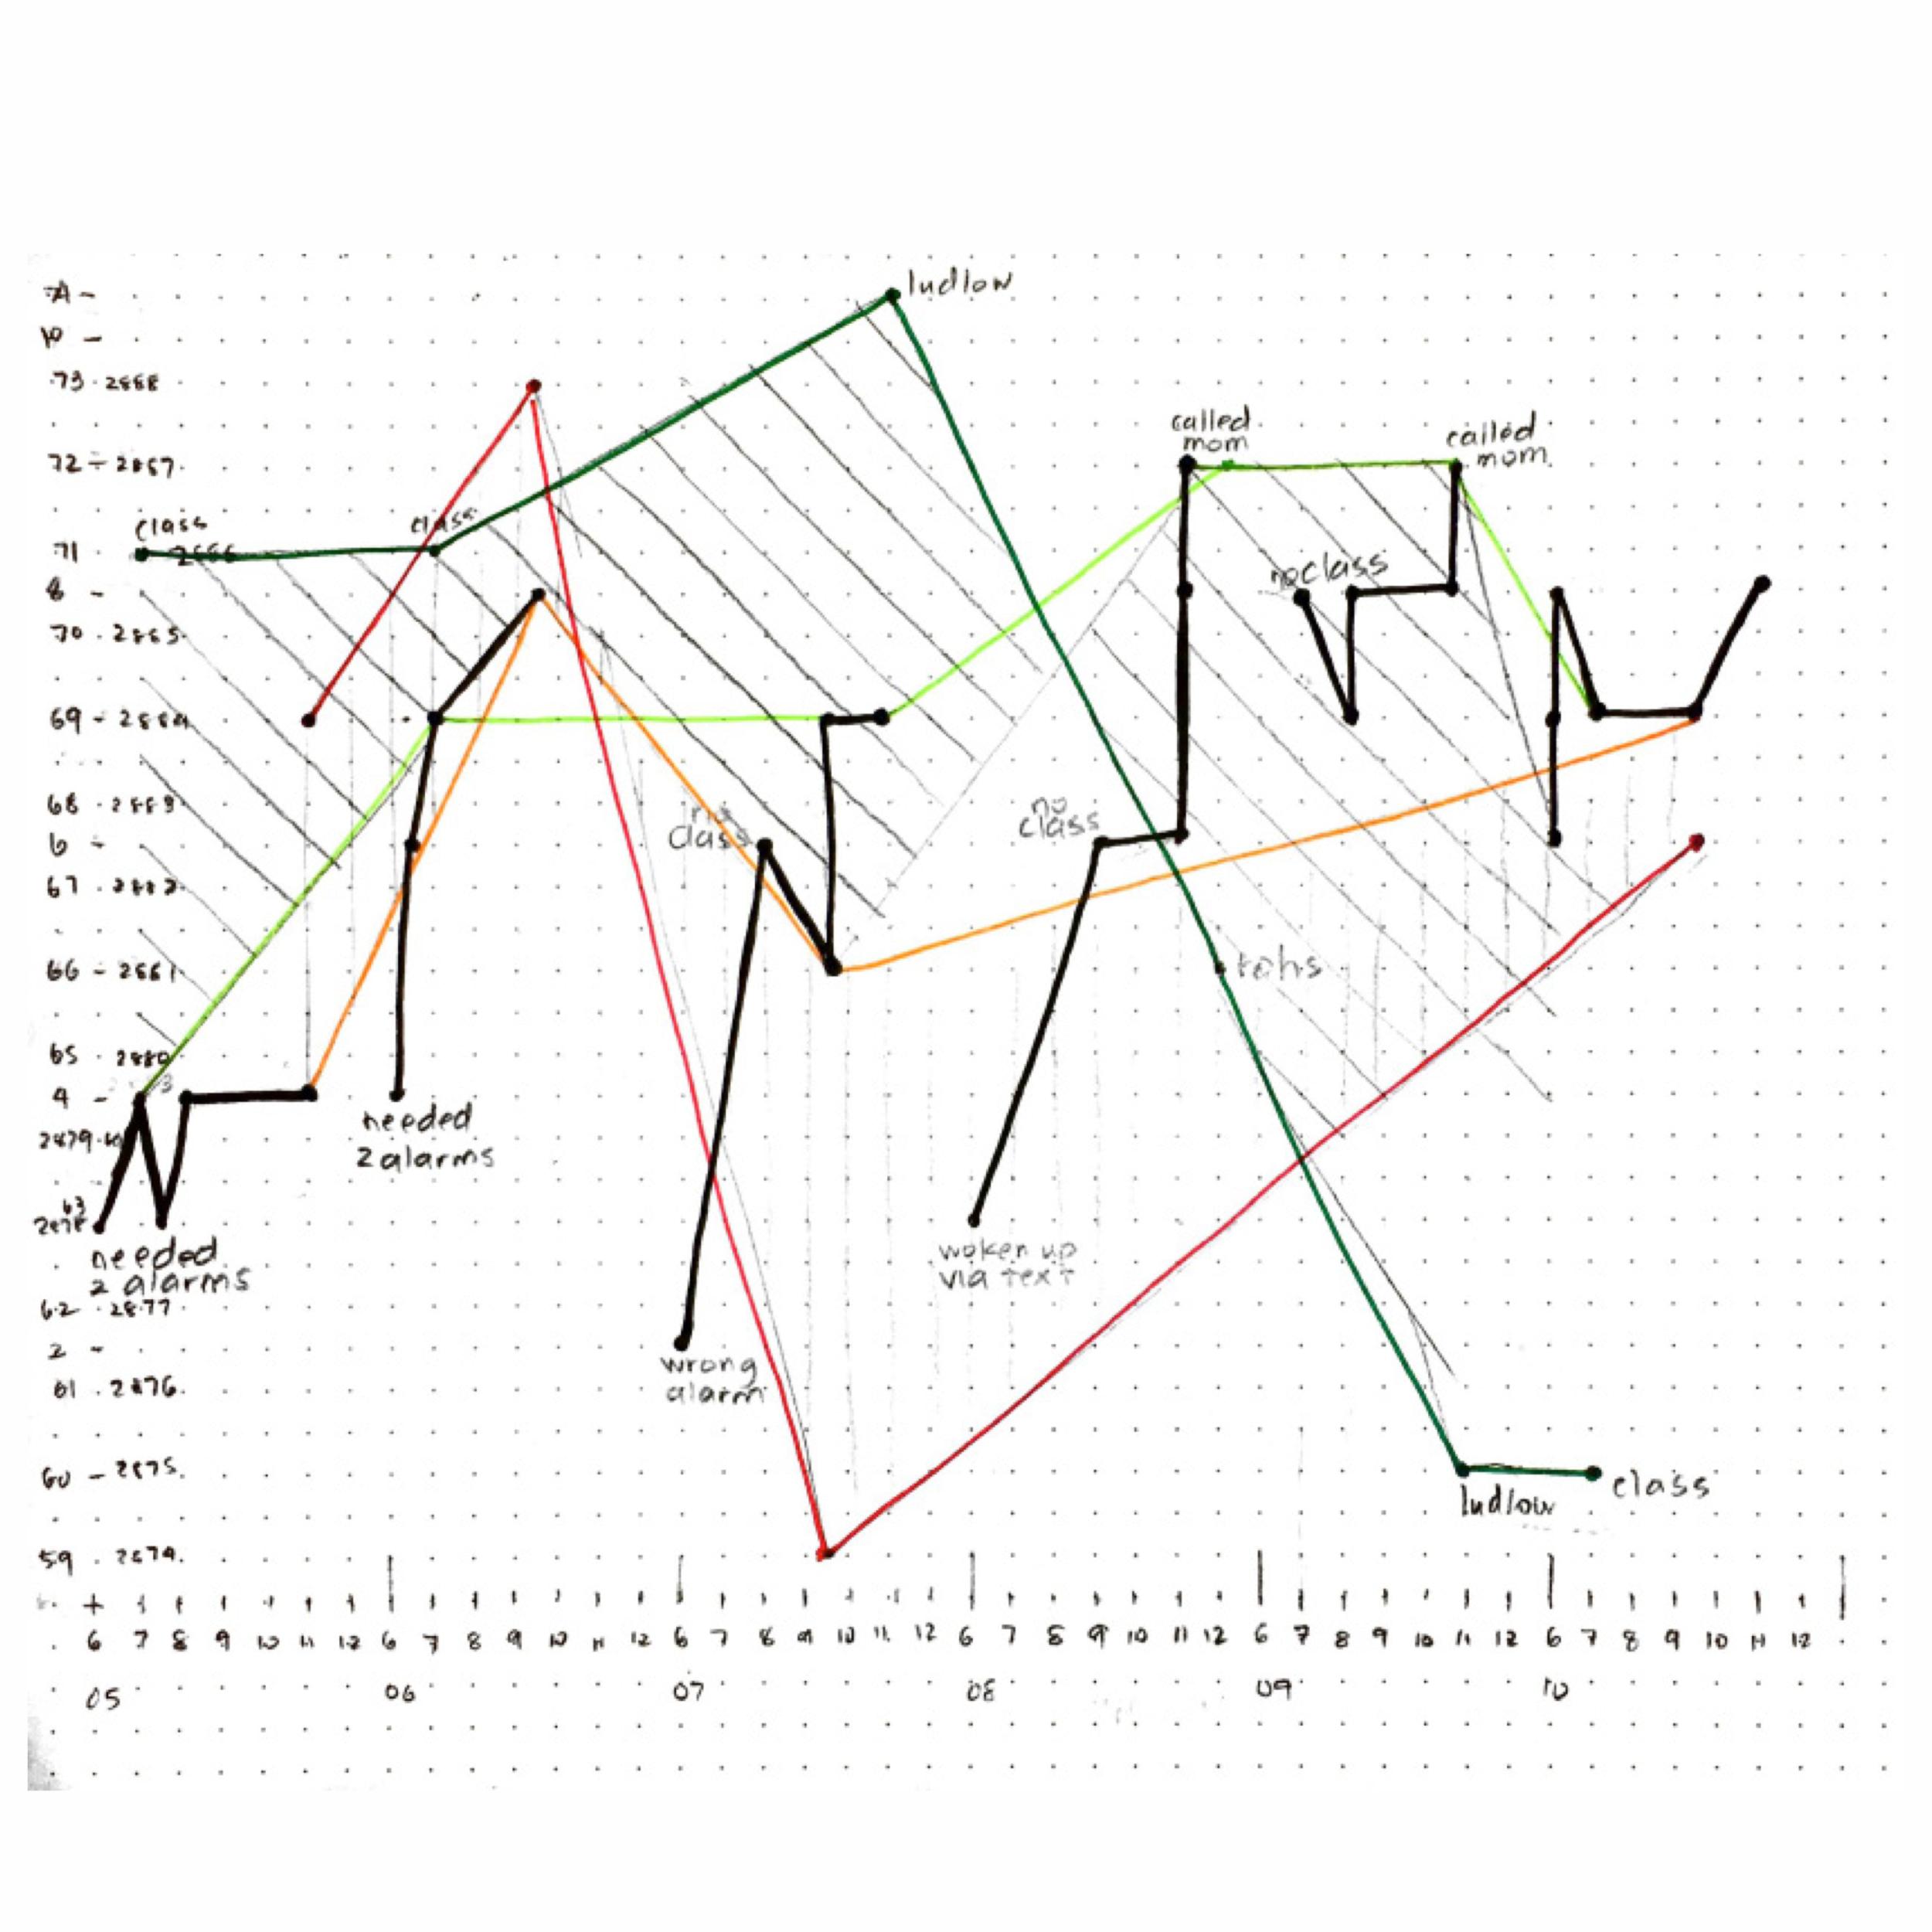 spotify_datavis-sketch-2.png